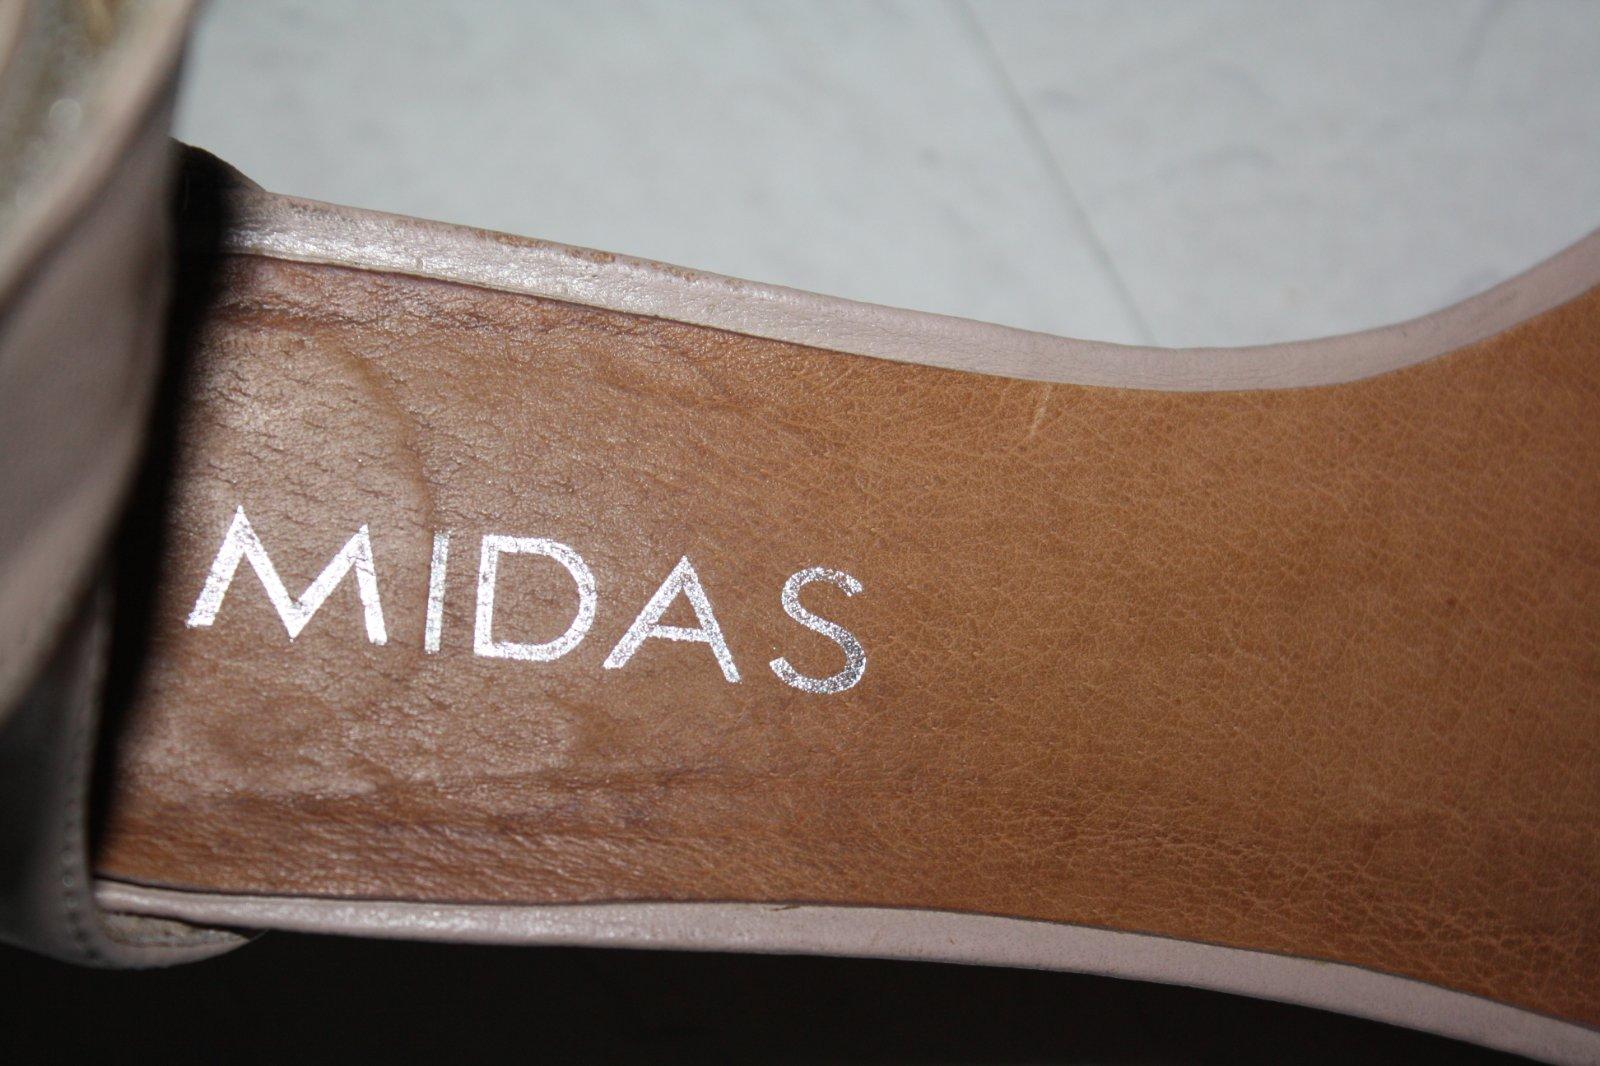 762e833c1030 Zobraz celé podmienky. Midas - pudrovo ruzove kozene sandale ...